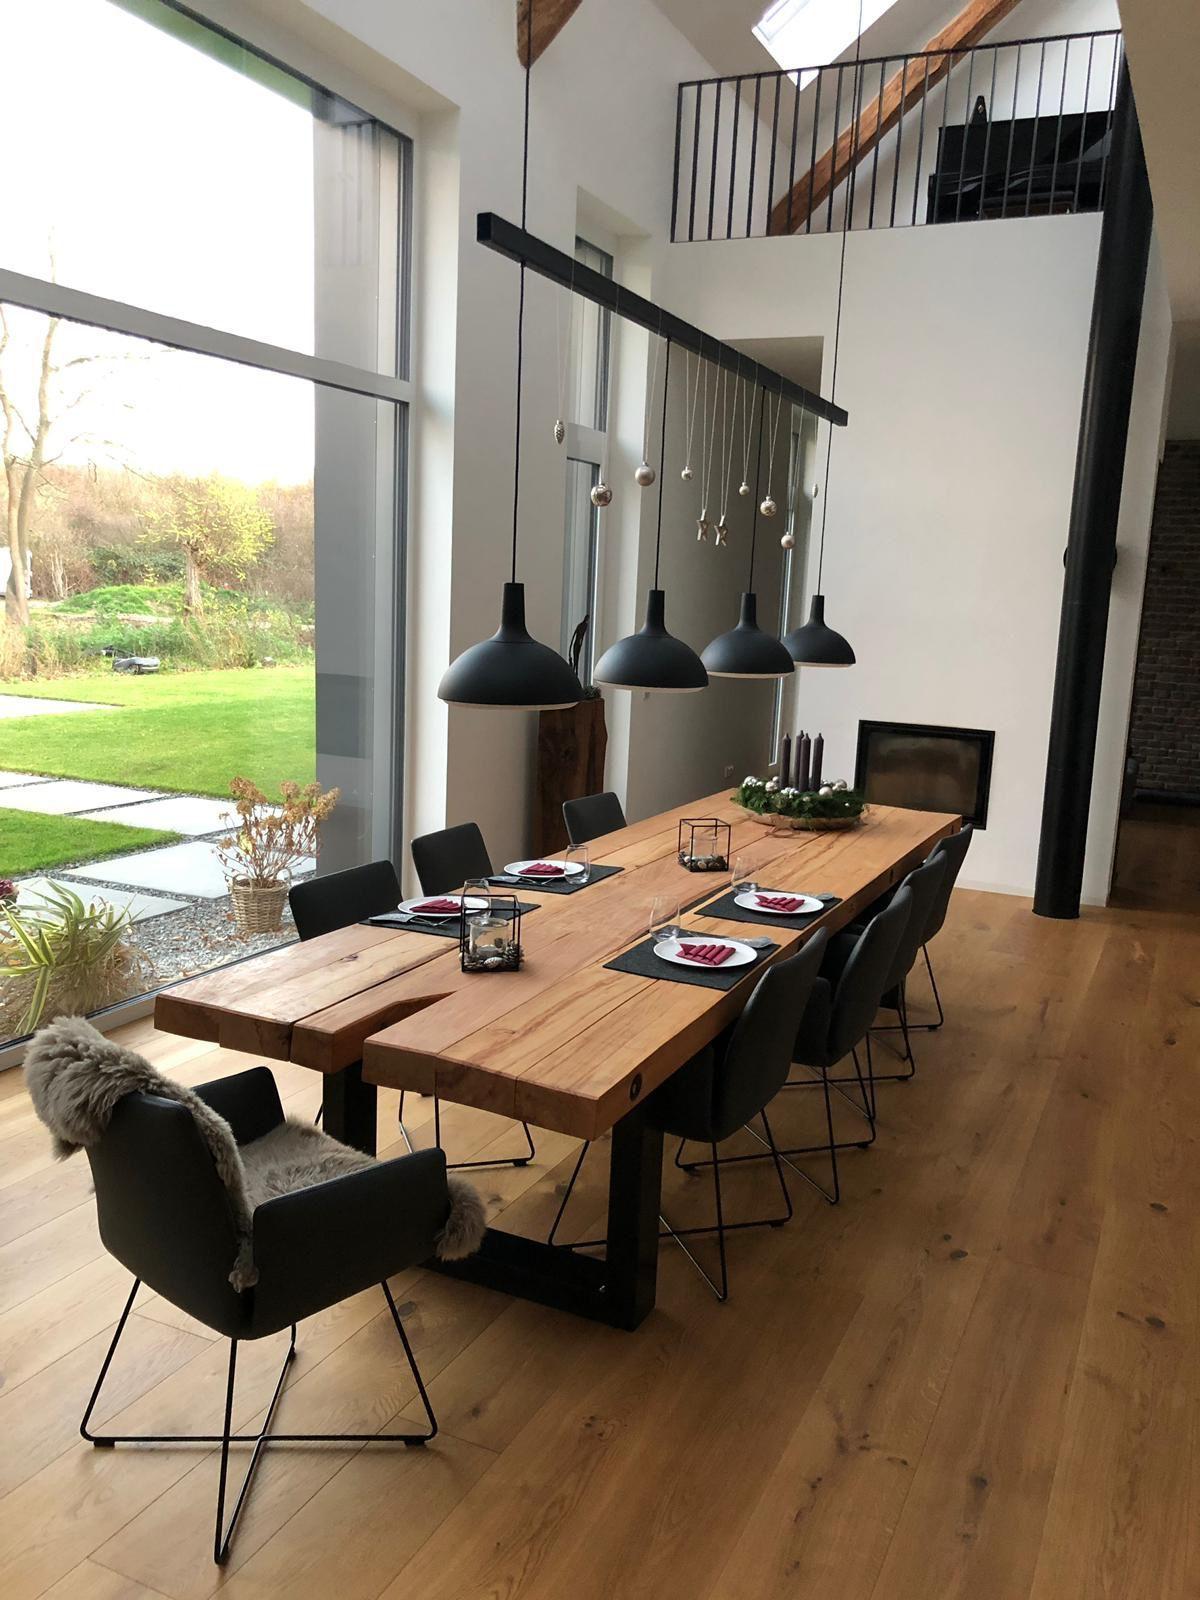 Baggermatten Esstisch Tafel 4 00x1 20m Individuelle Anfertigung 400x120m Anfertigung Dining Room Inspiration Dining Room Design Modern Dining Room